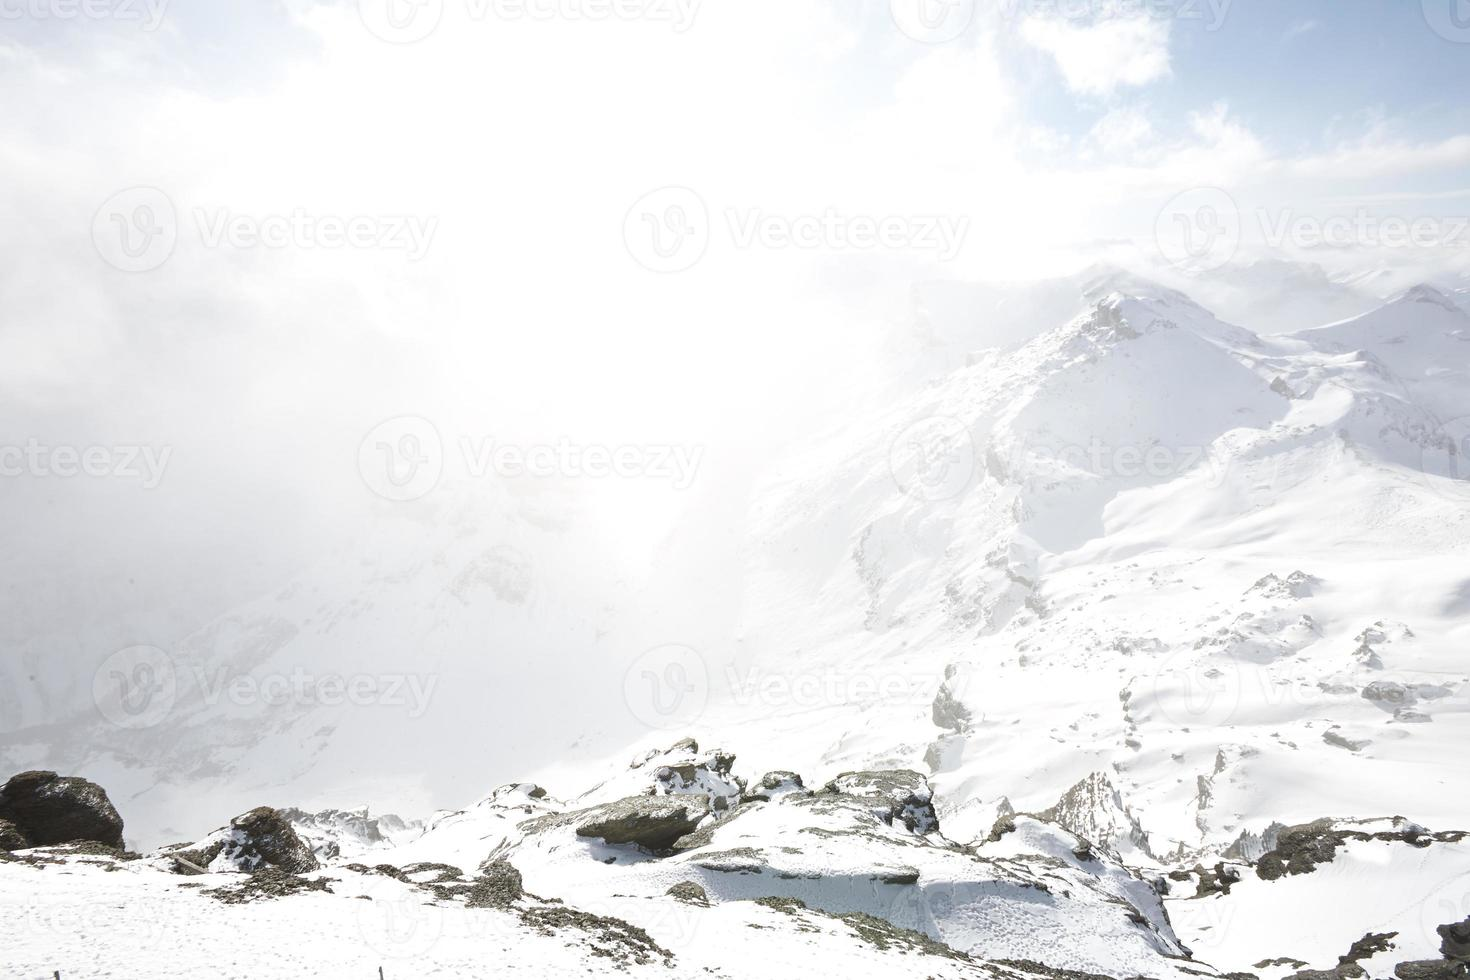 Snow dusts gather over the mountain peak photo